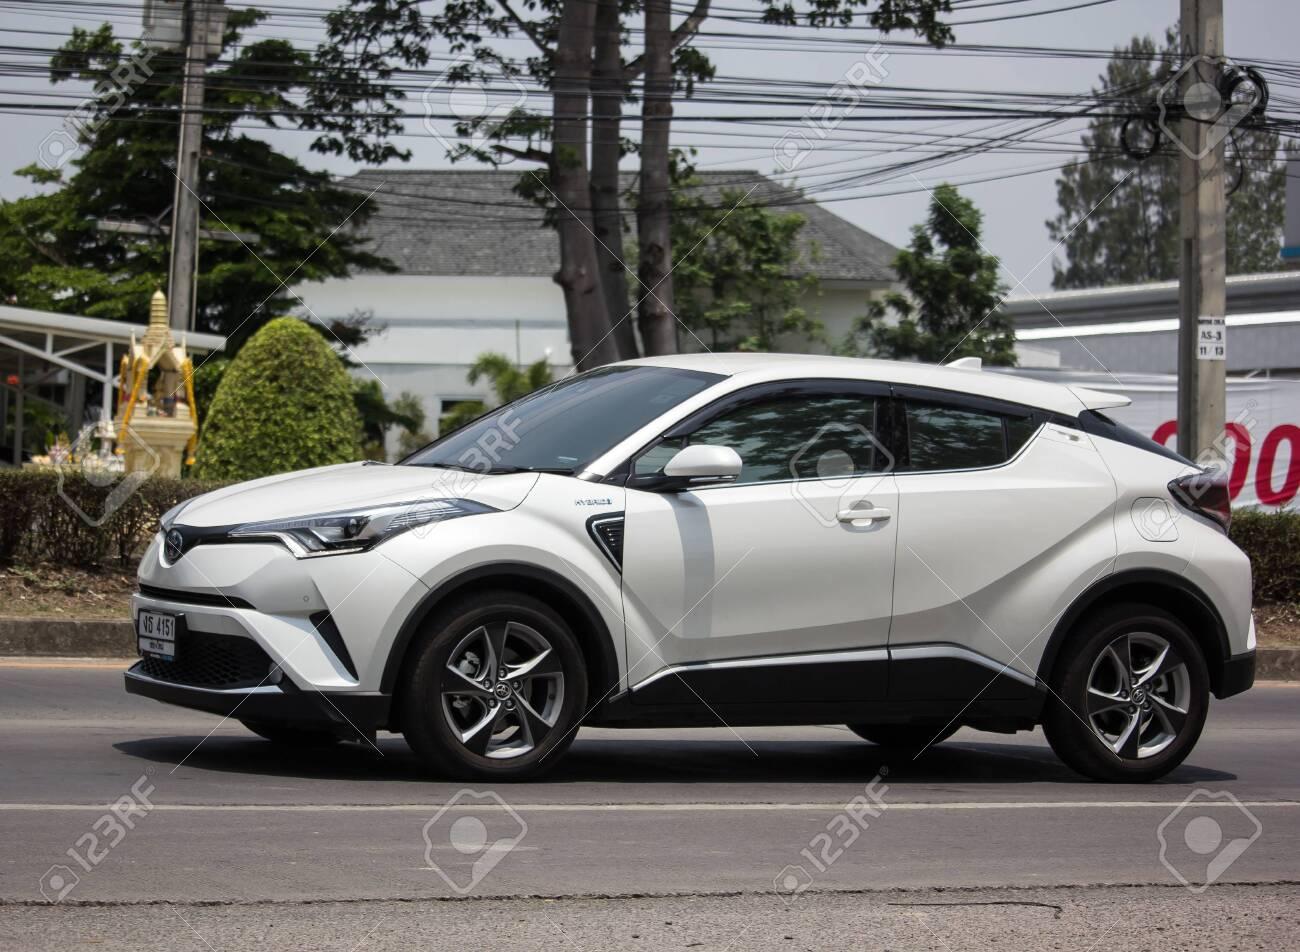 14+ Toyota Subcompact Crossover Suv Illustration